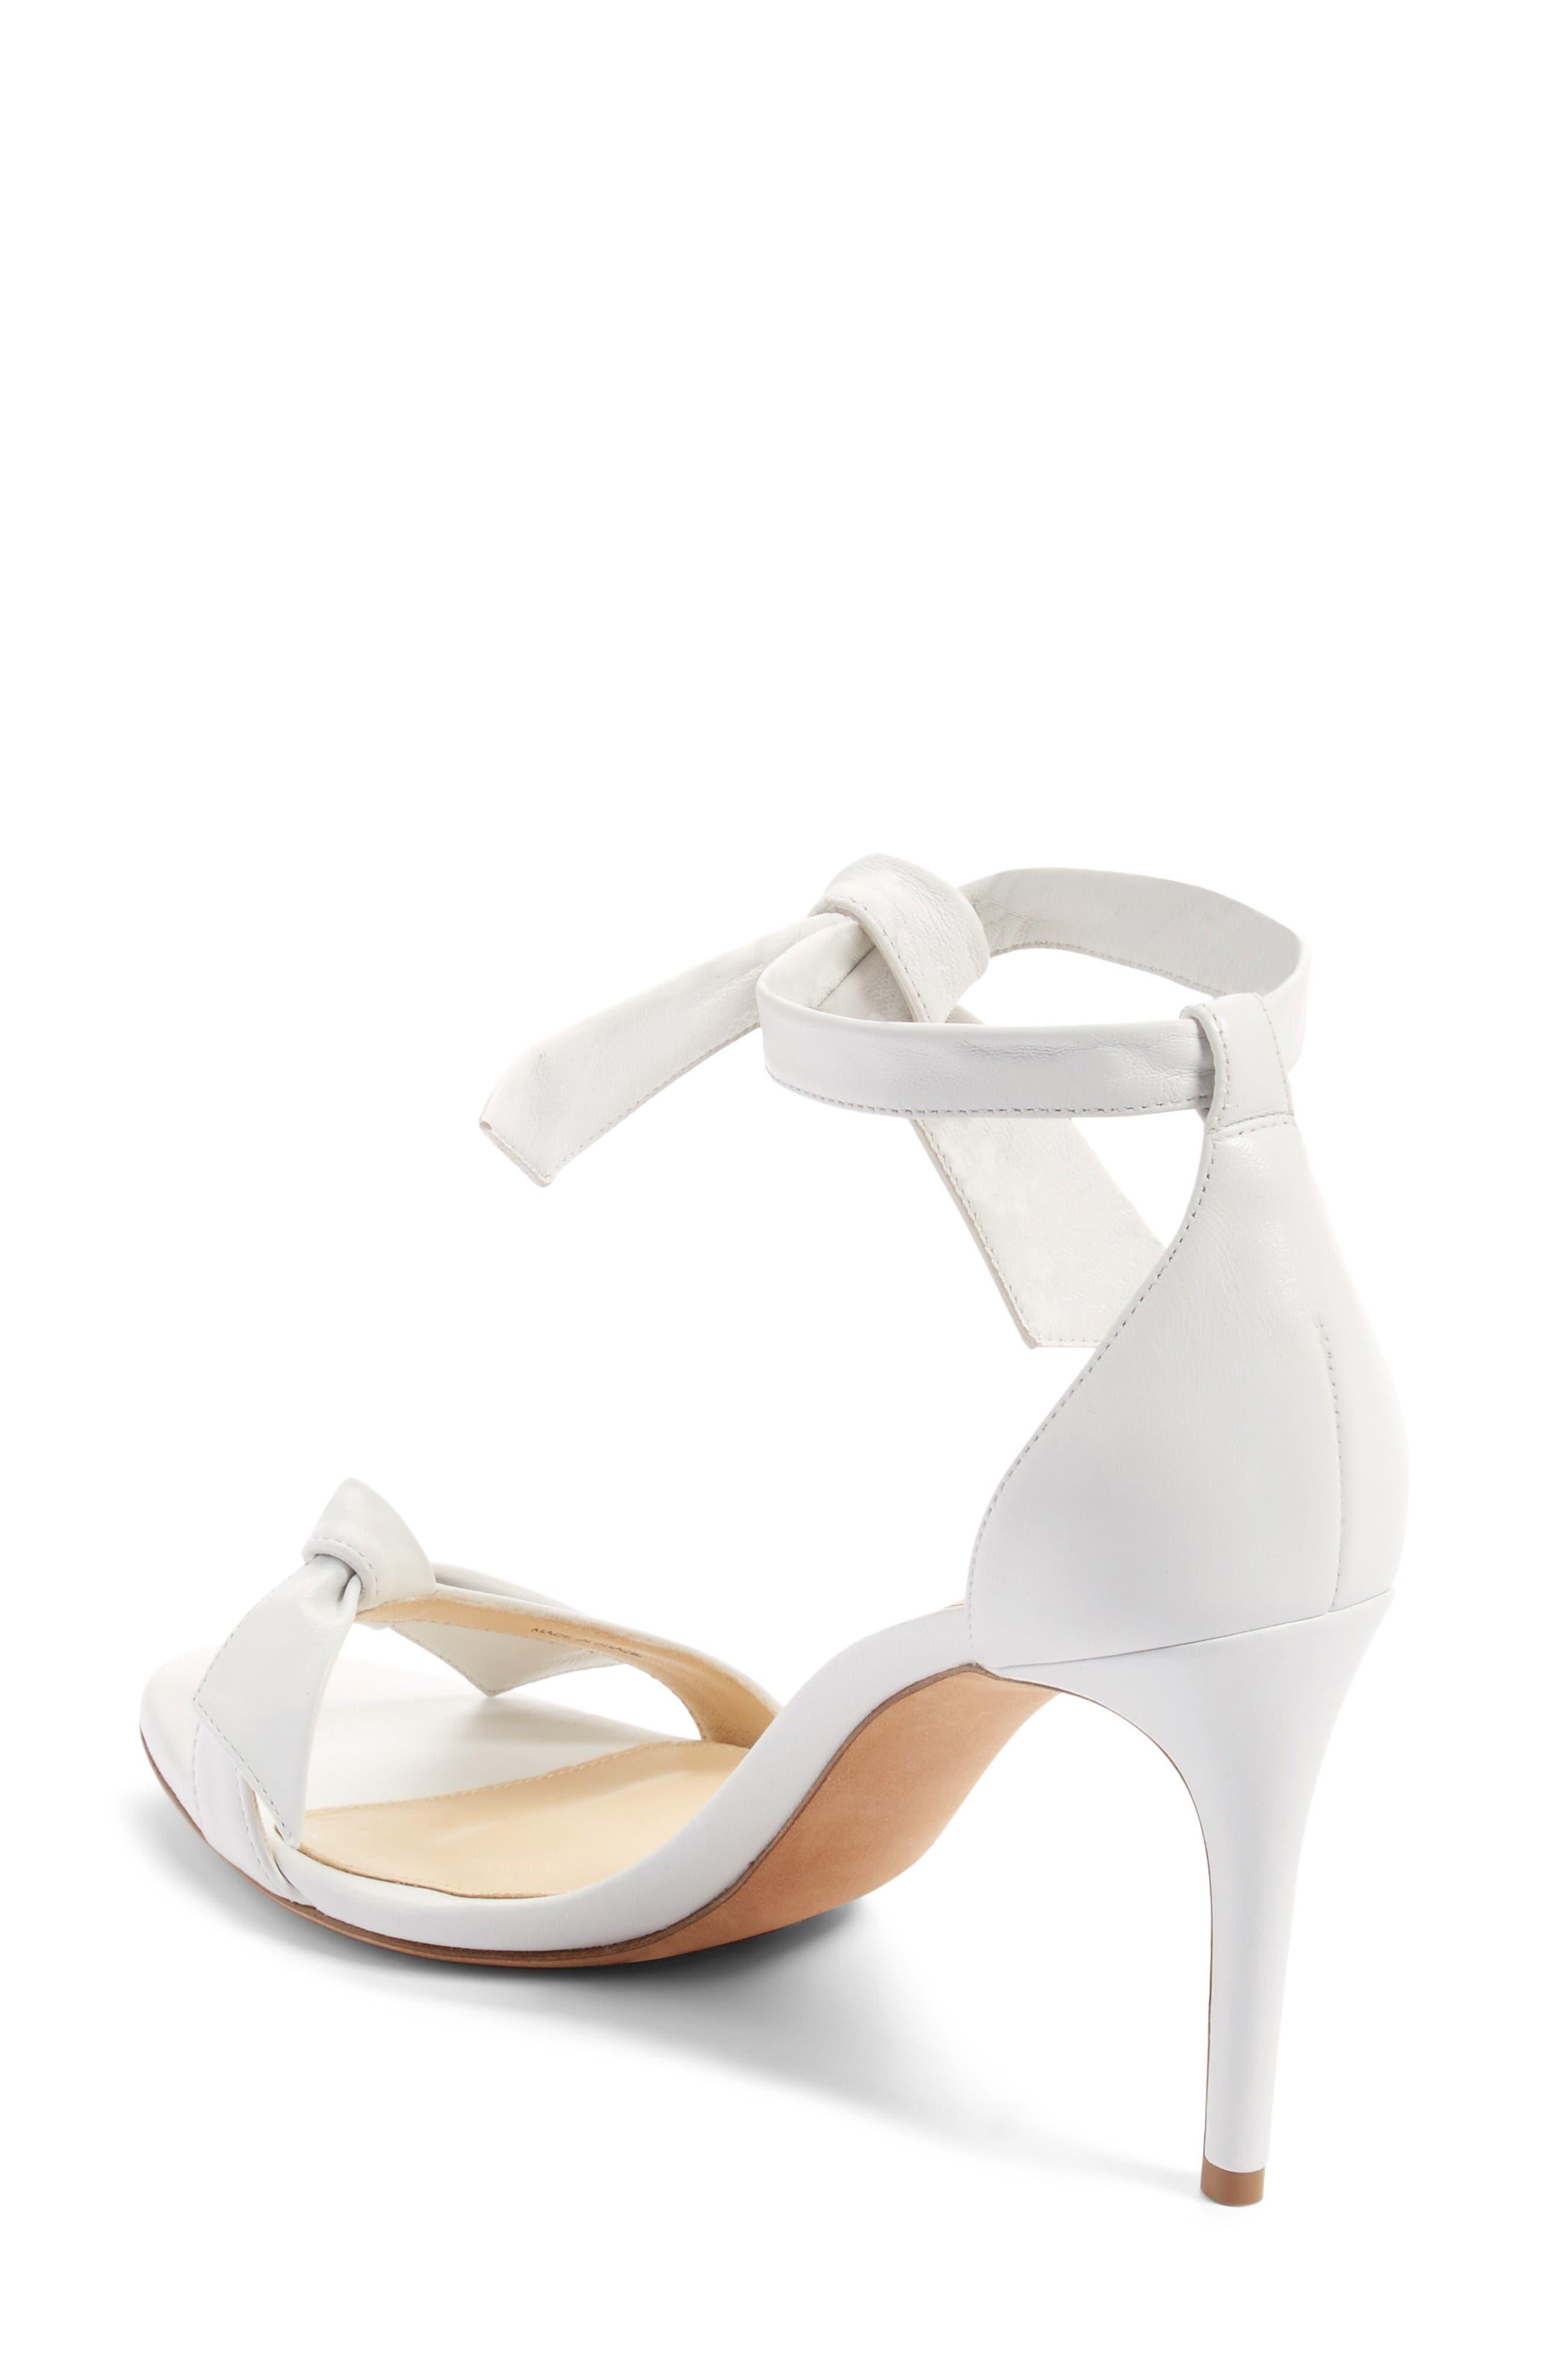 Clarita Ankle Tie Sandal,                             Alternate thumbnail 2, color,                             White Leather